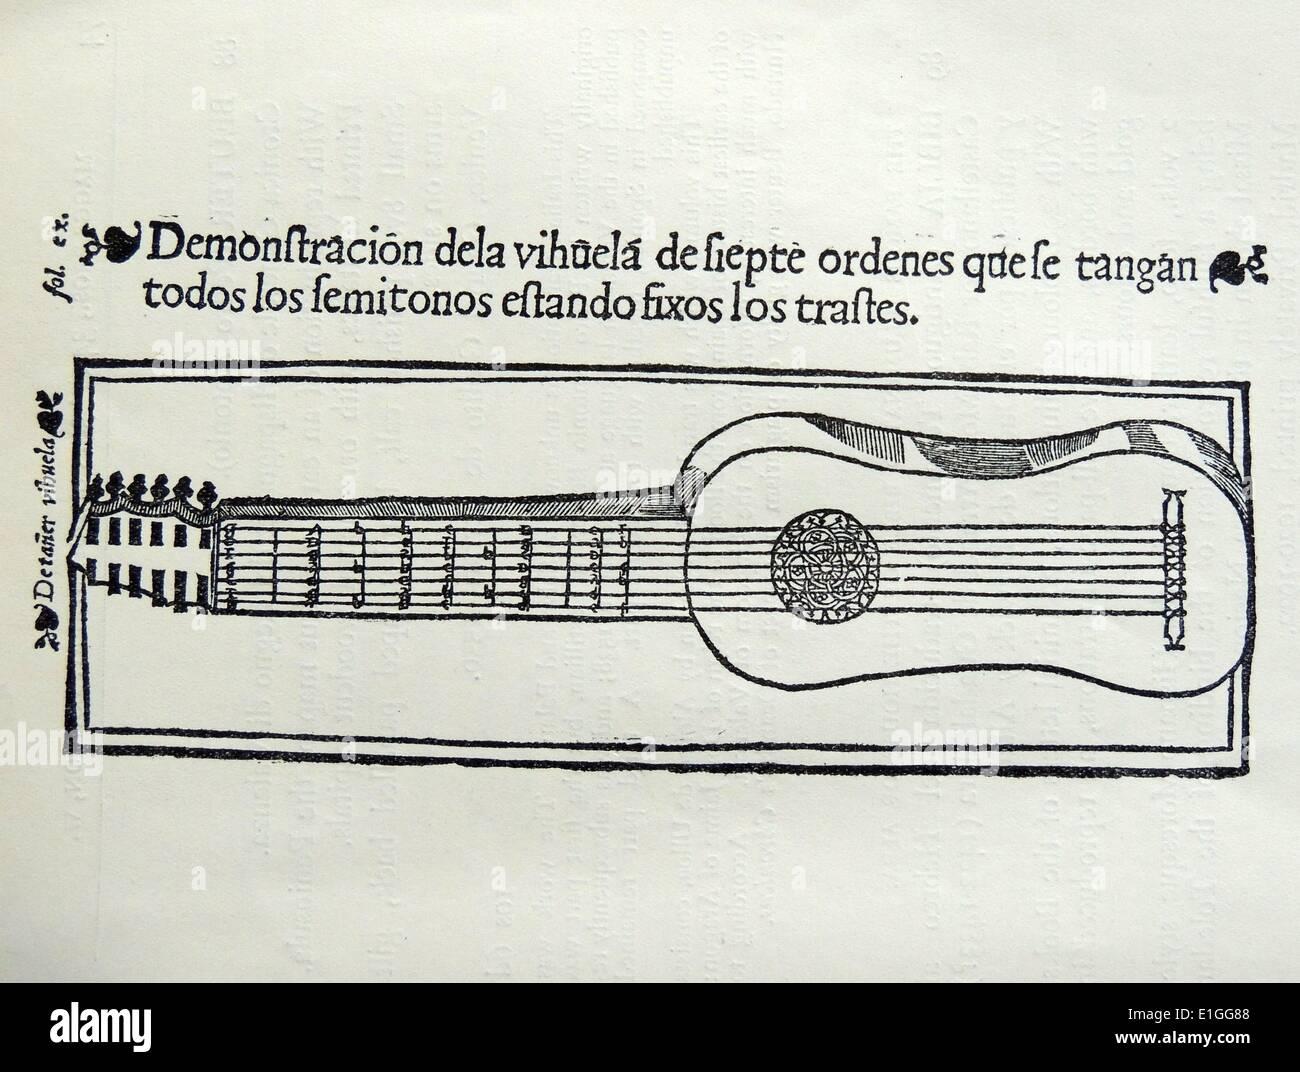 Xilografia da Bermudo Declaracio de Instrumentos Musicales. Oussuna. Datata 1555 Immagini Stock